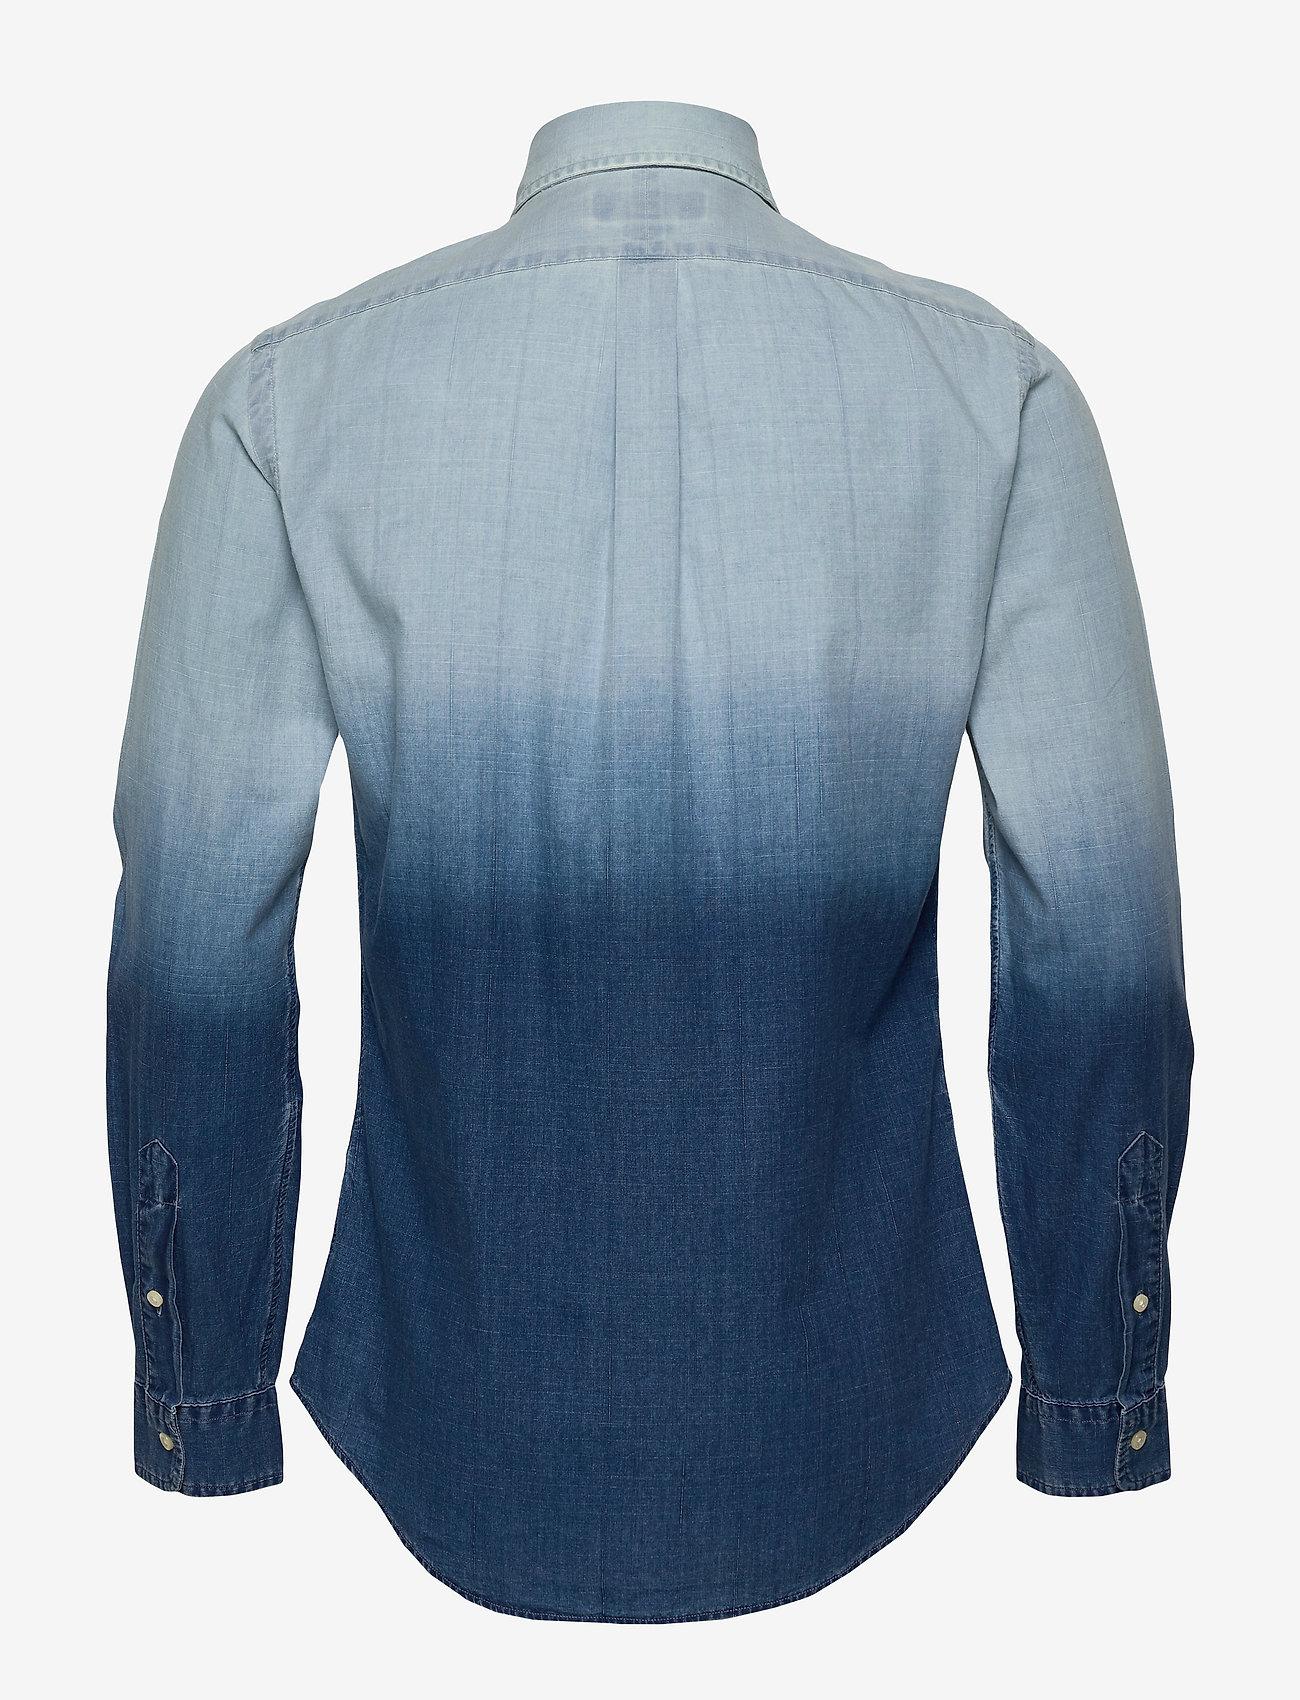 Polo Ralph Lauren - INDIGO SOLID-SL BD PPCSPT - podstawowe koszulki - 4380 blue dip dye - 1